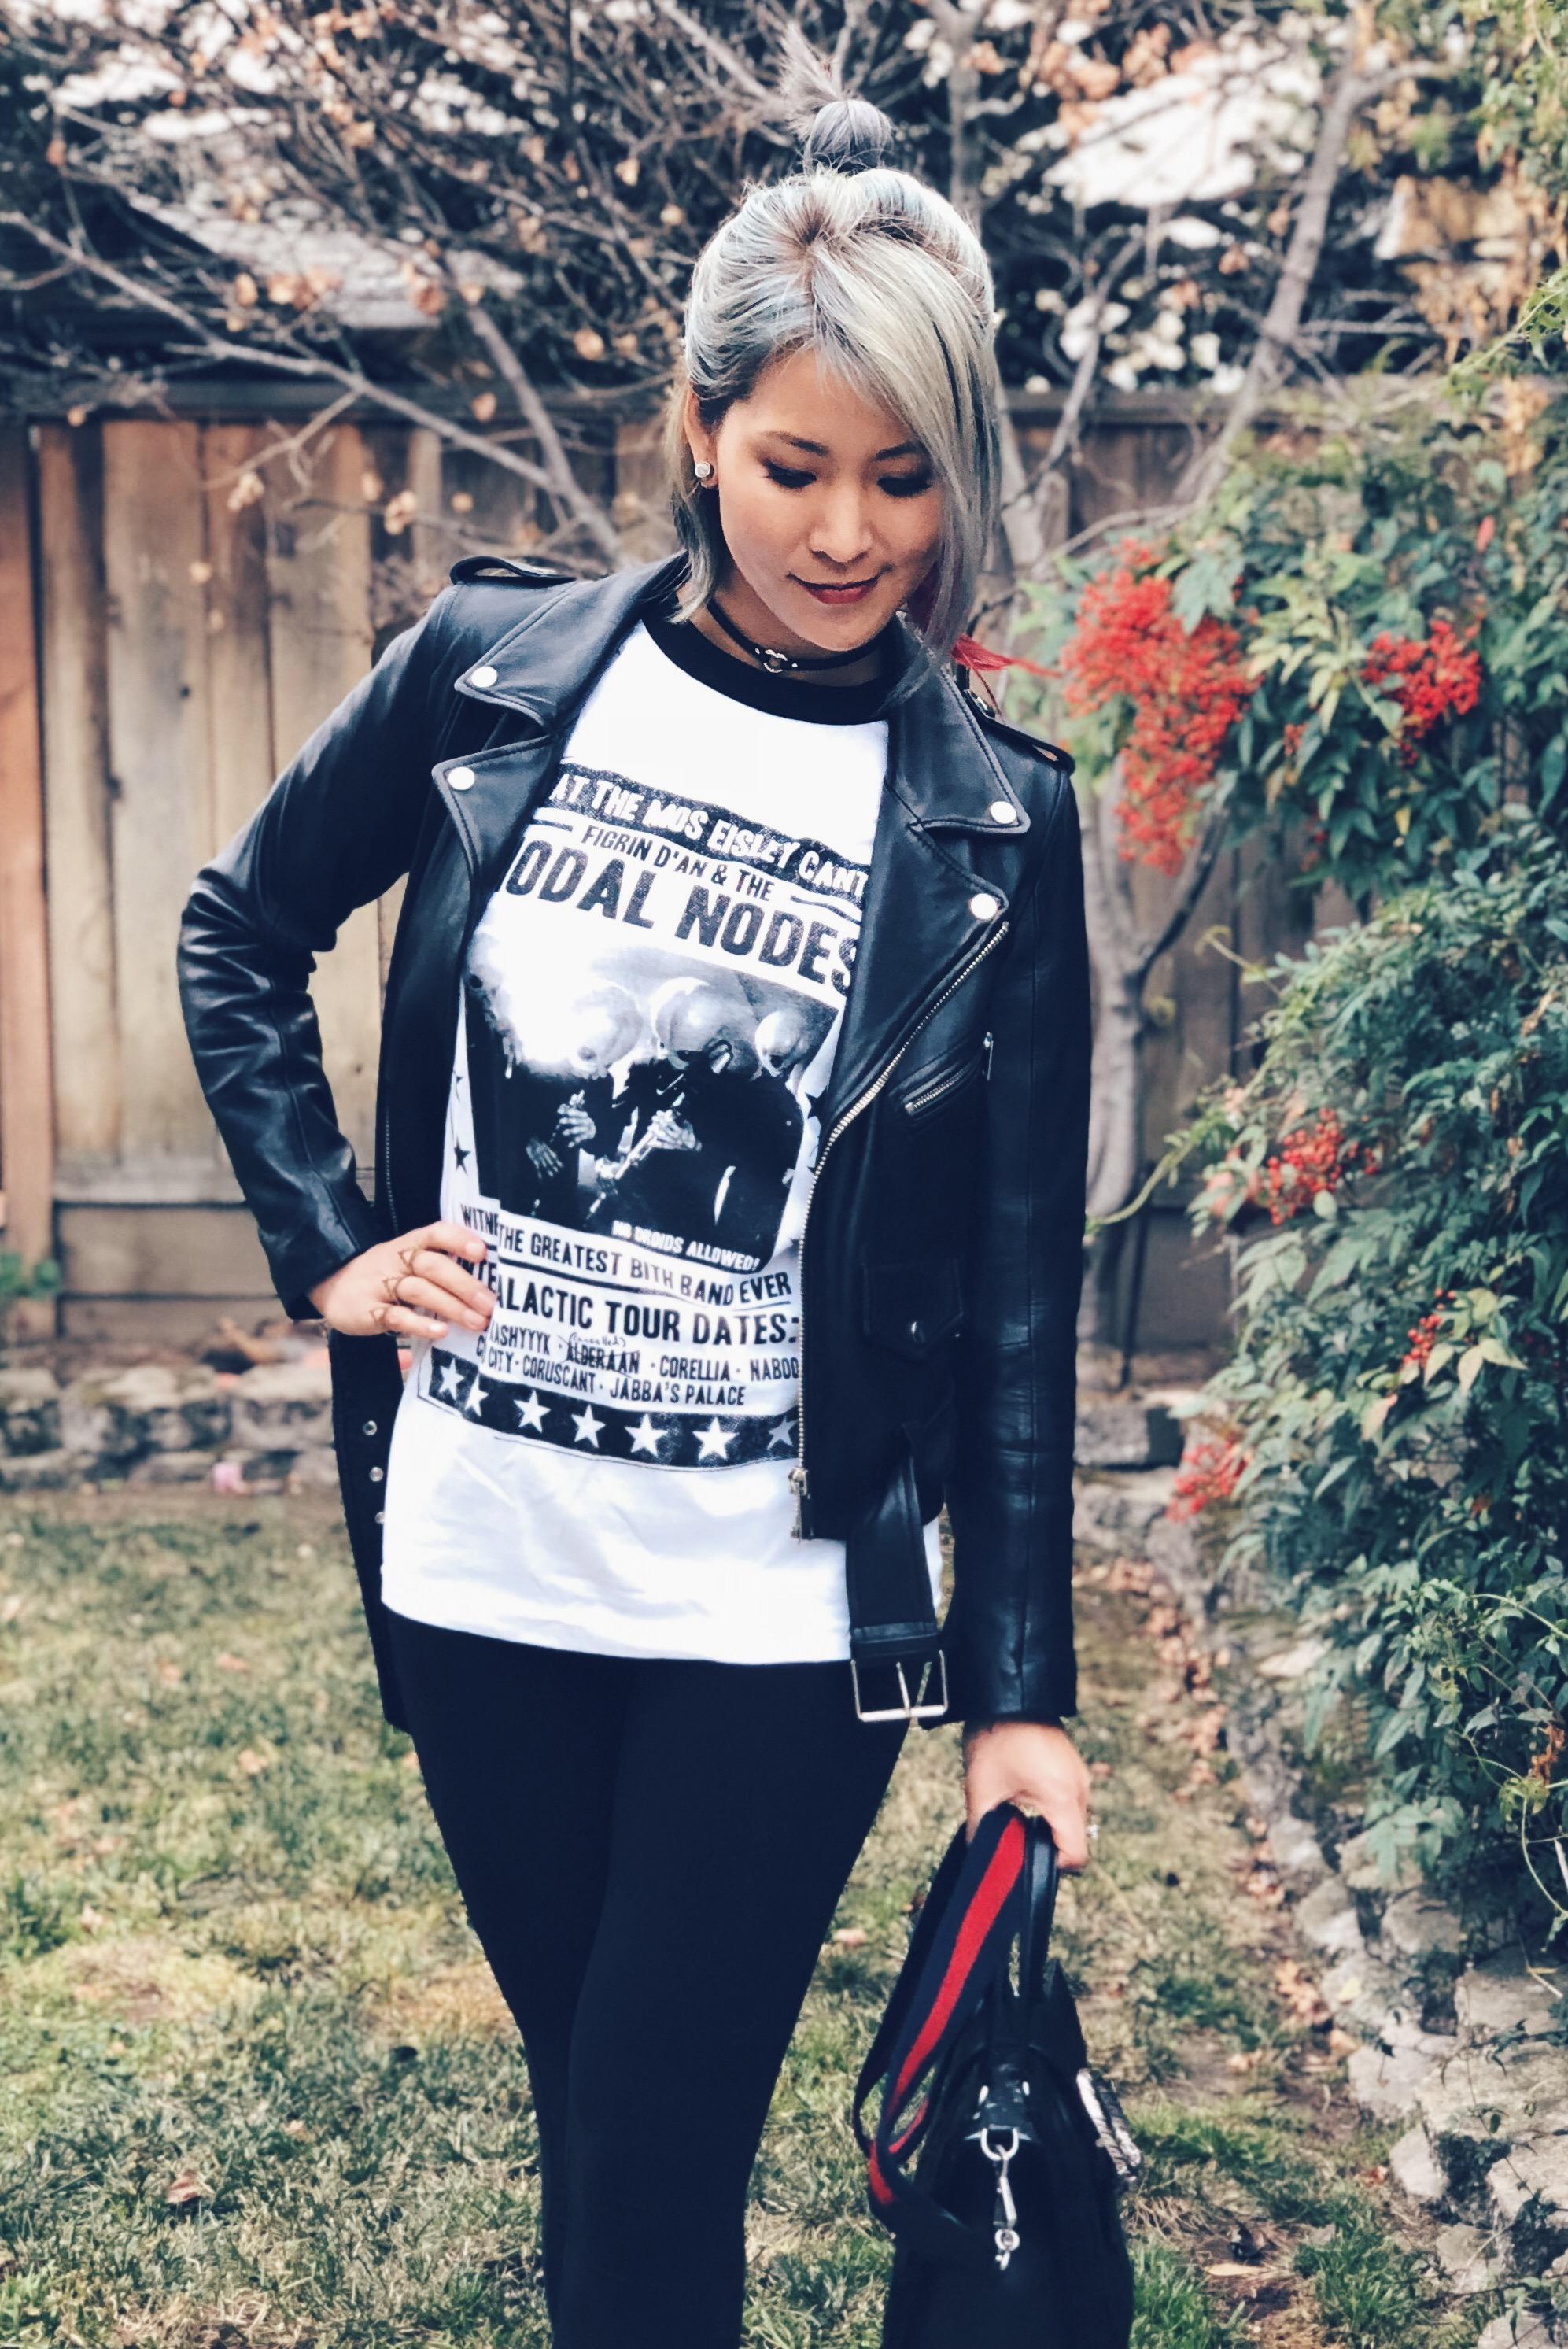 Modal Nodes Cantina Band Punk Concert outfit